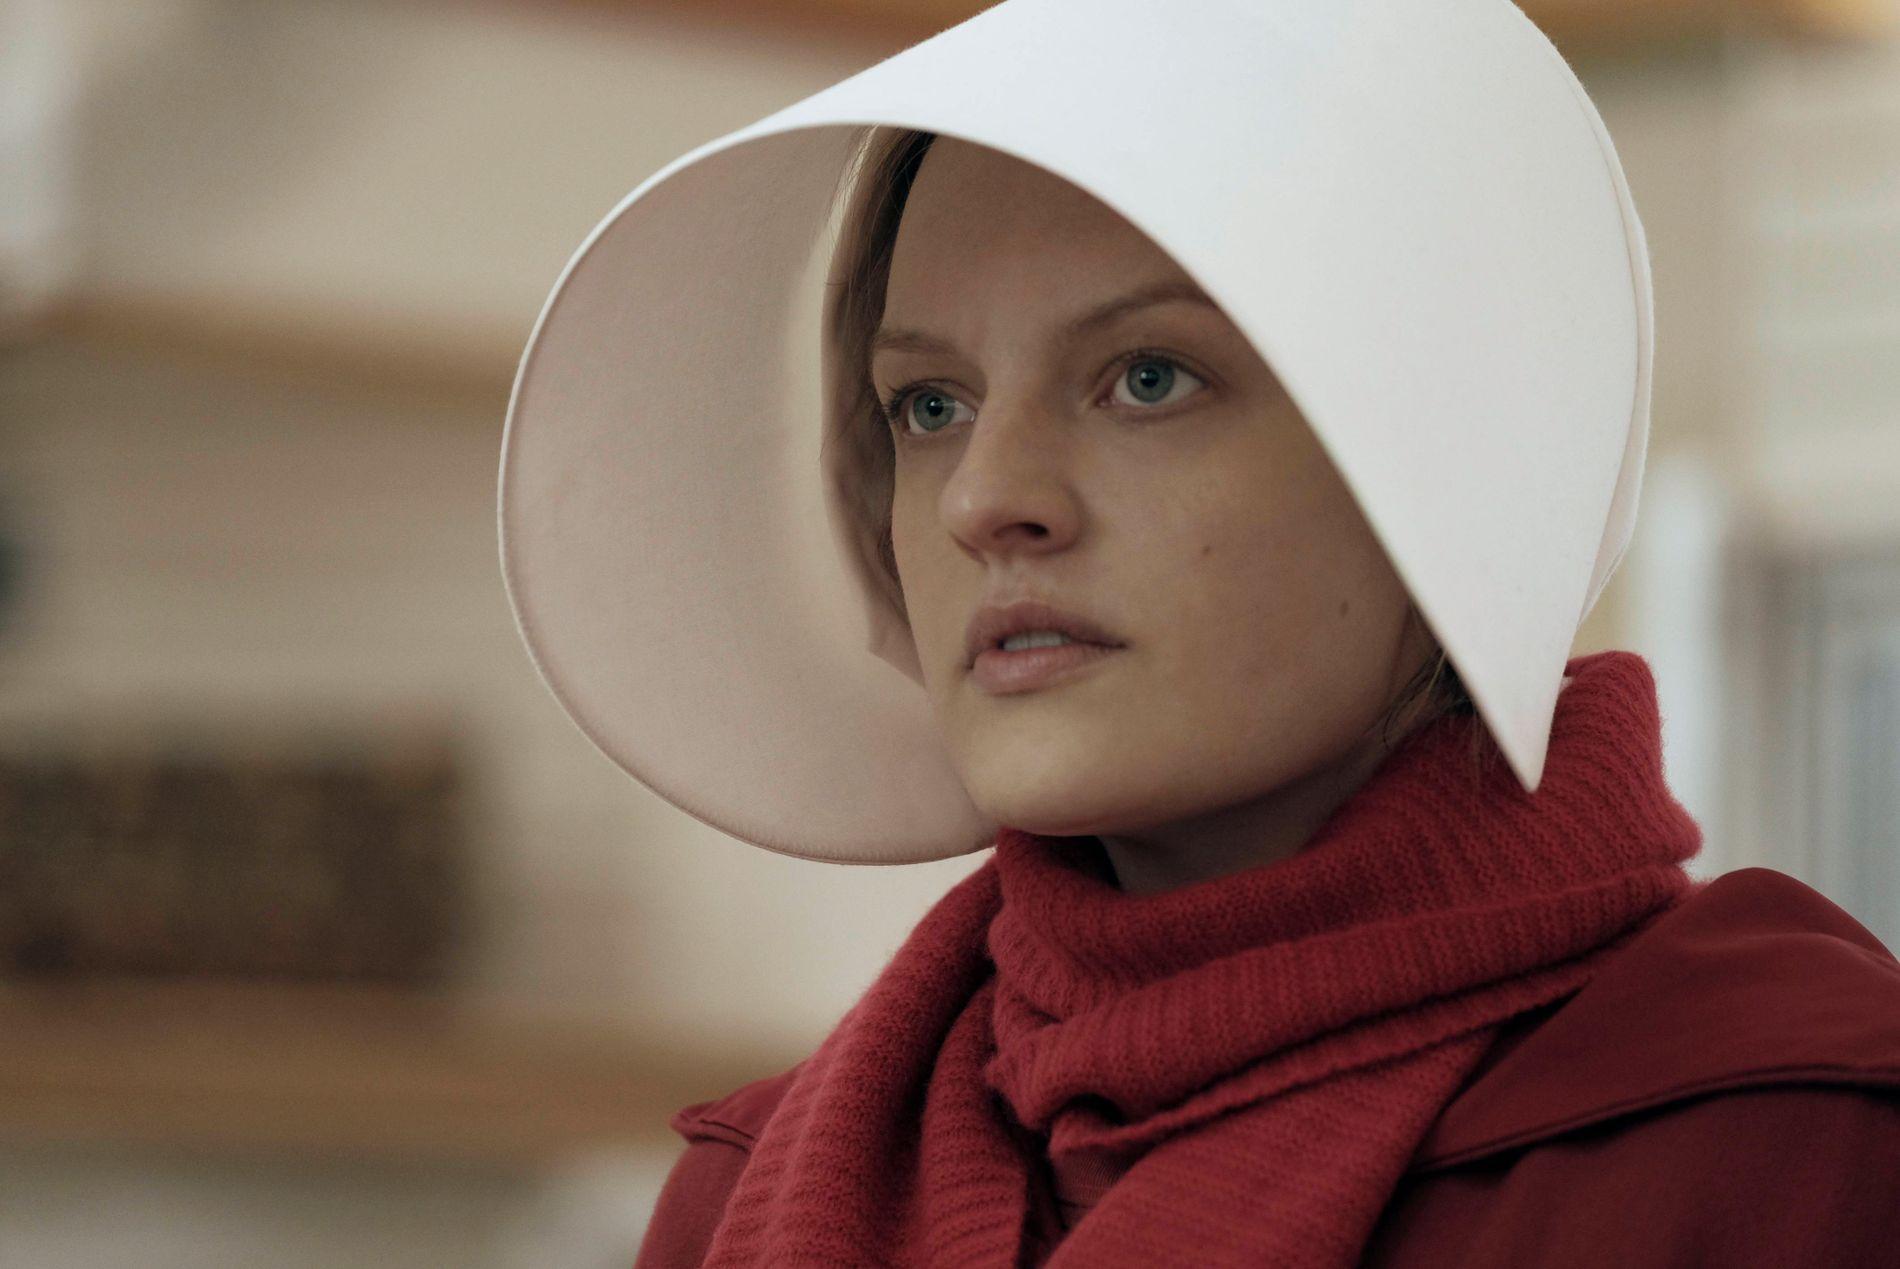 NOMINERT: Både «The Handmaid's Tale» og Elisabeth Moss er nominert.